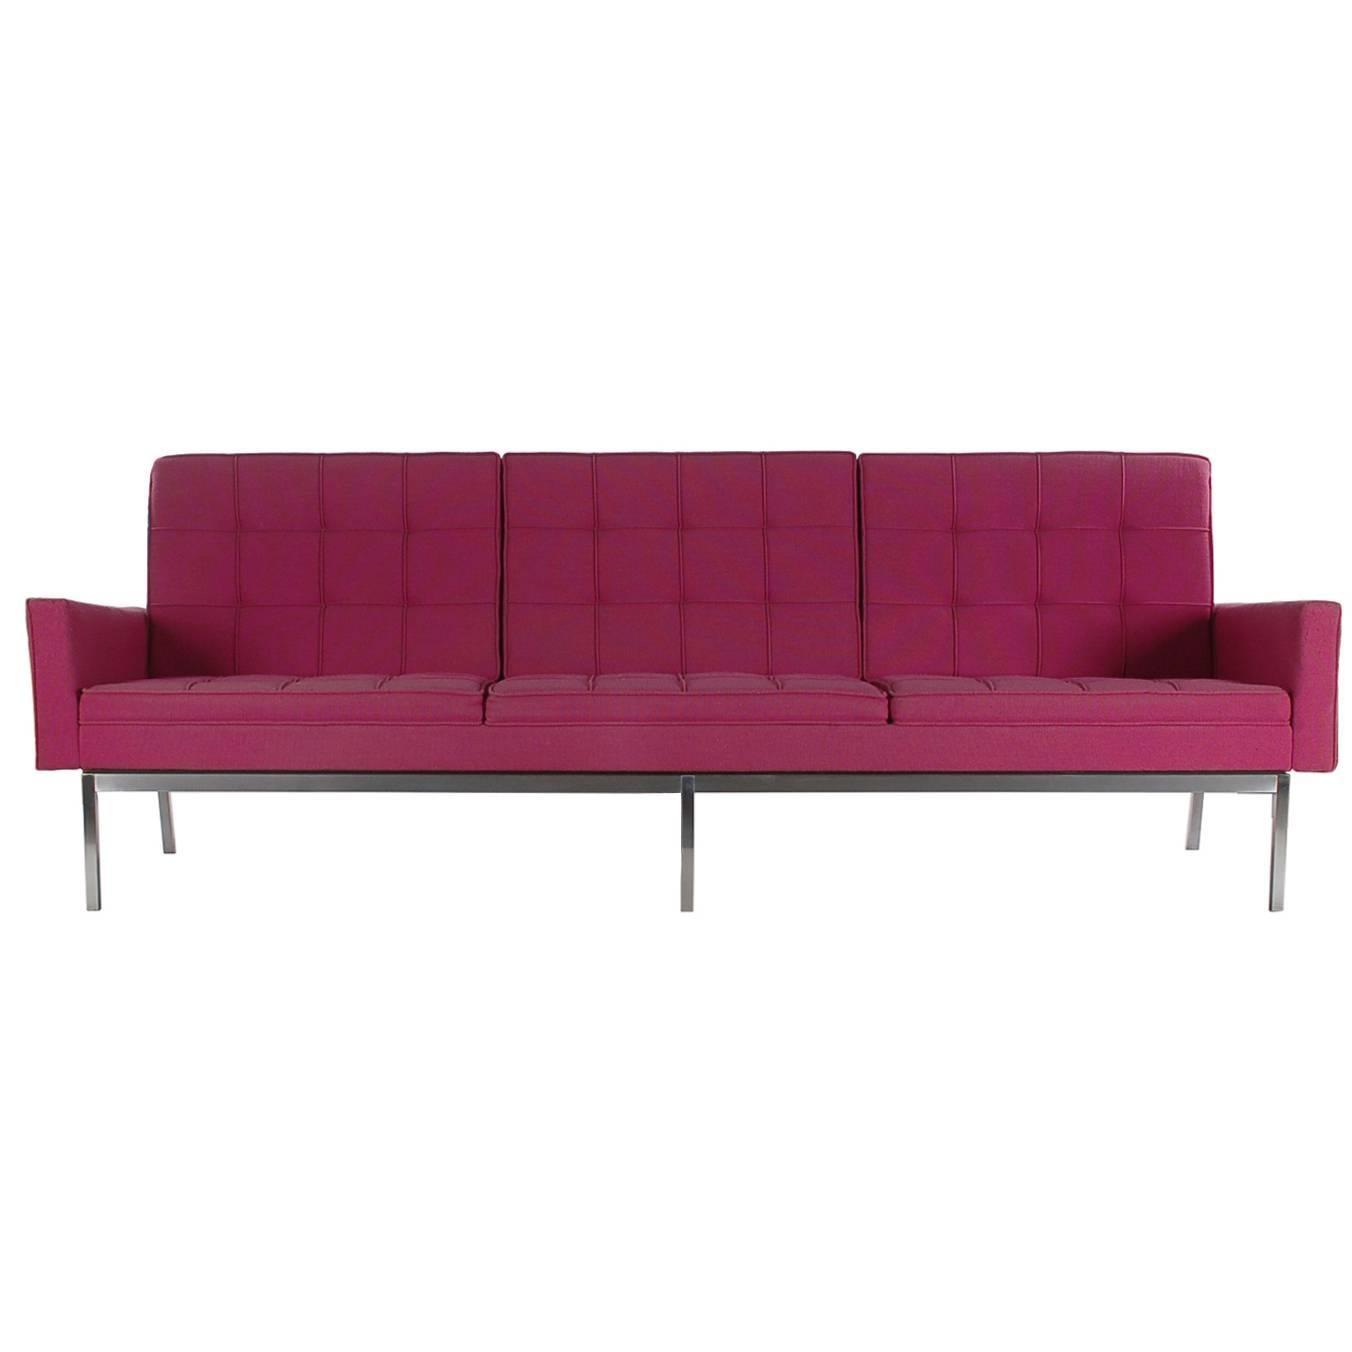 Florence Knoll for Knoll Mid-Century Modern Sofa in Fuchsia